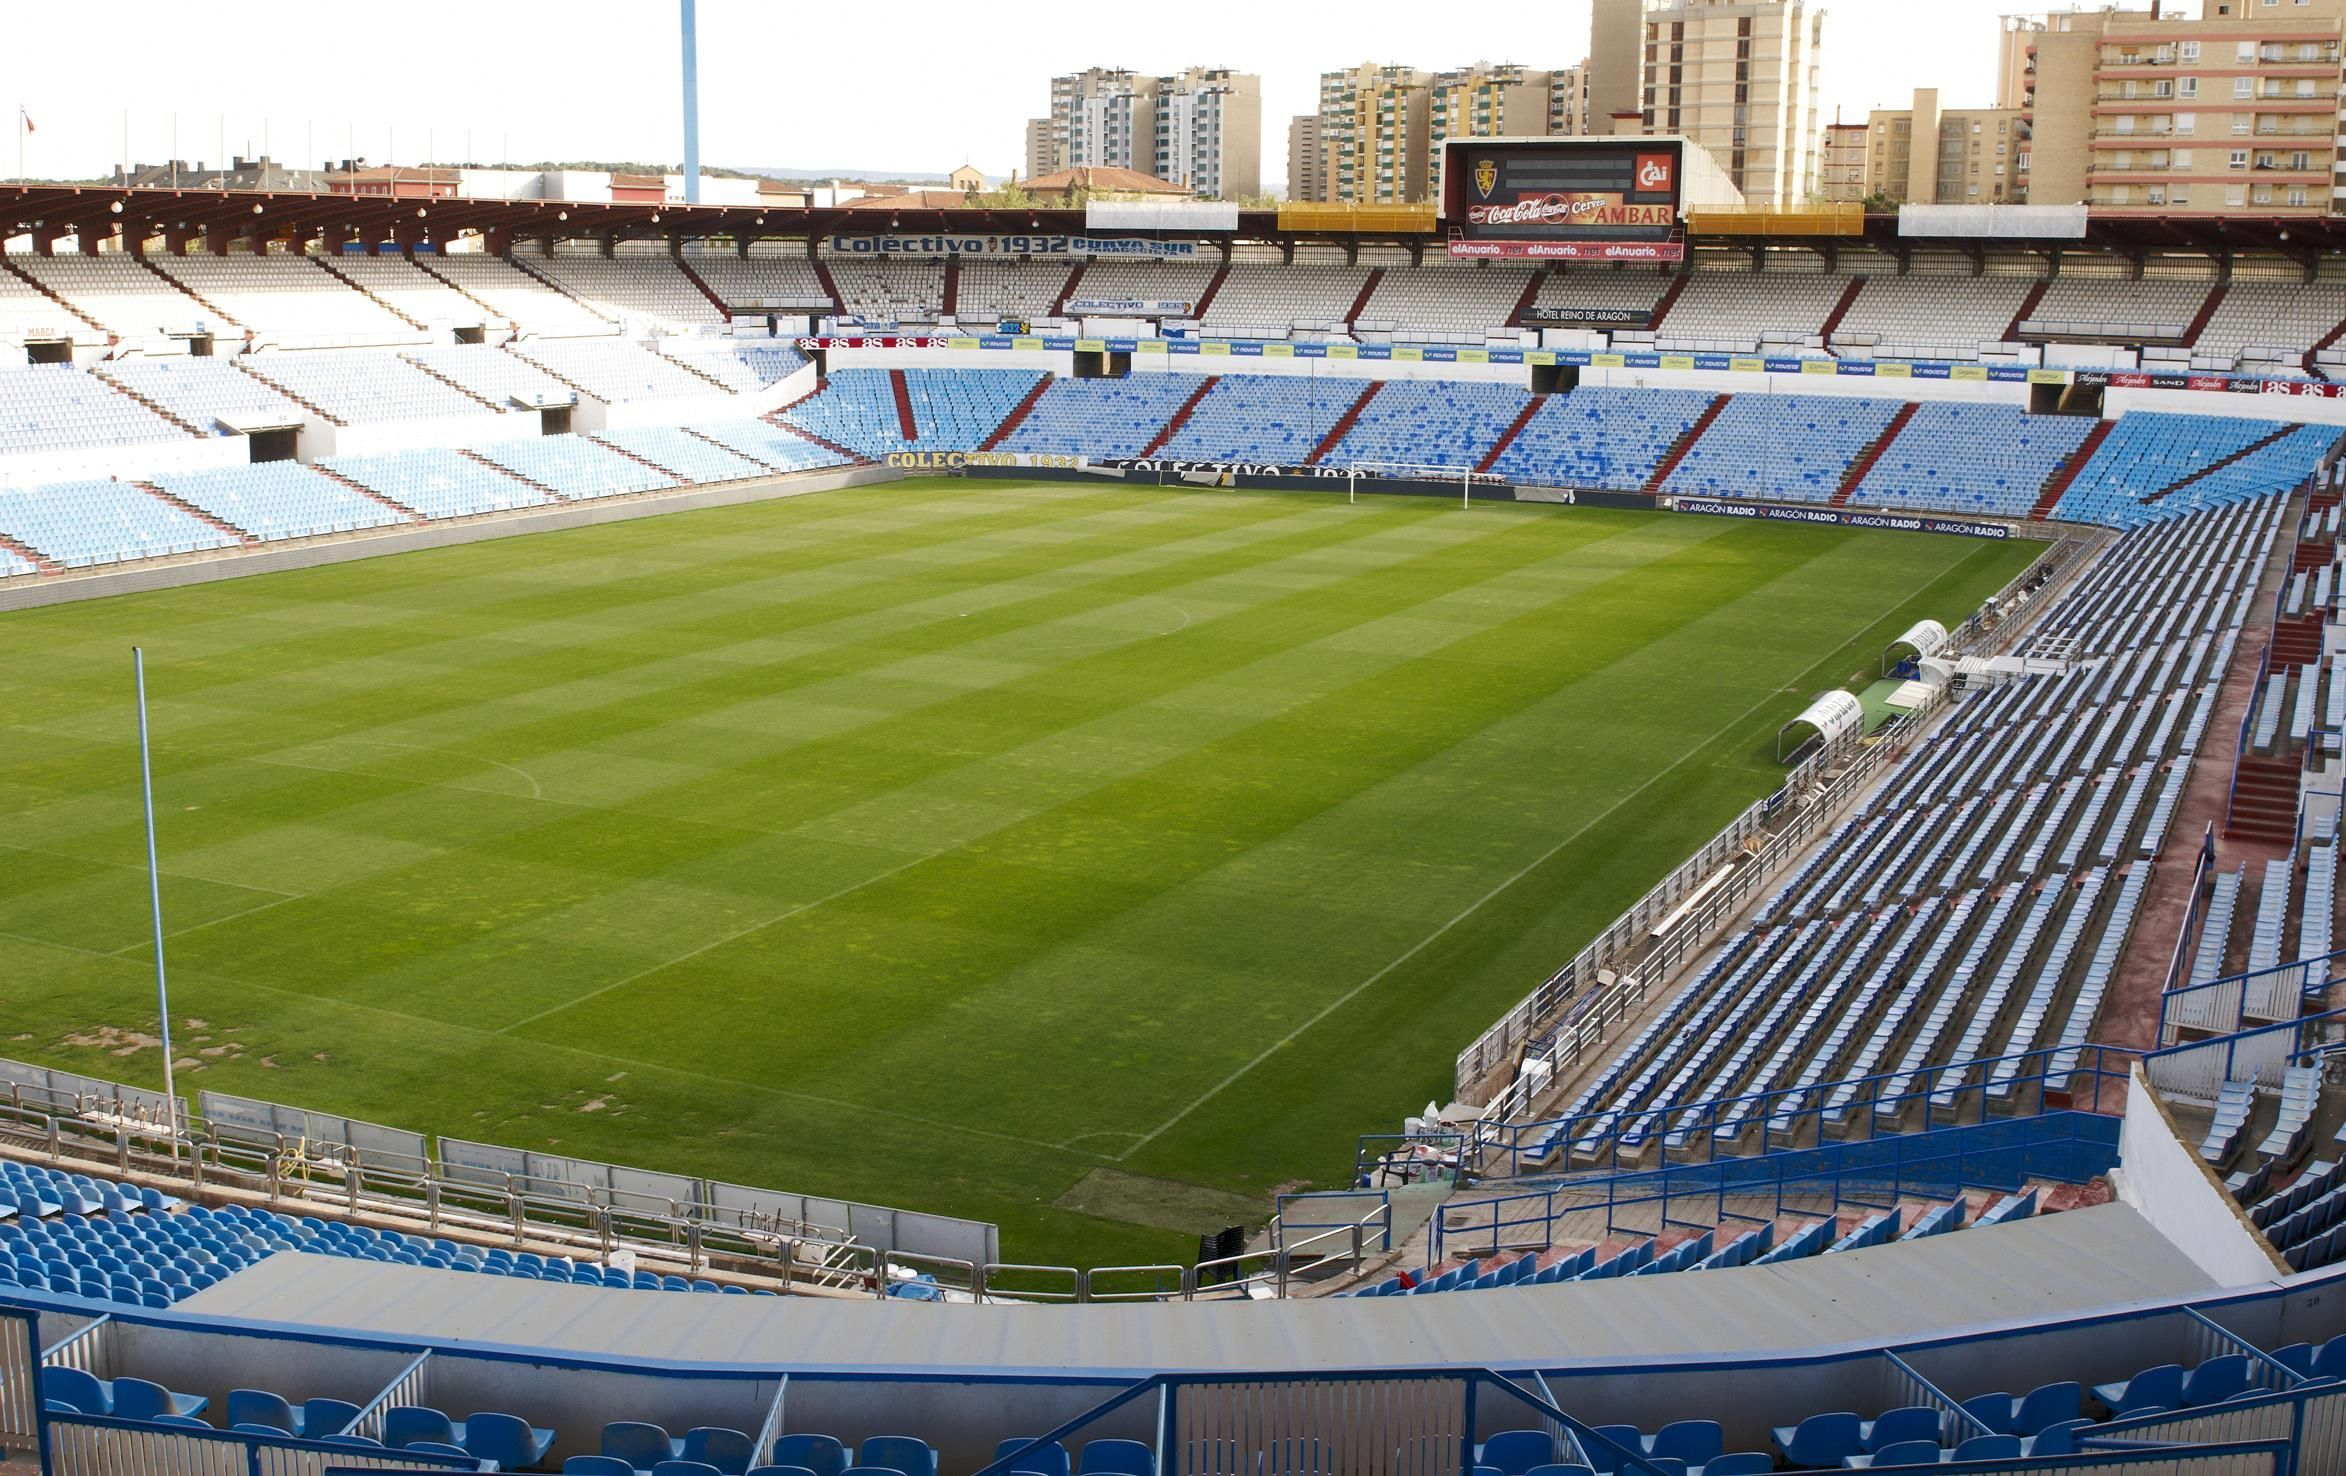 3480 - ¿Cuánto sabes de estadios de fútbol? [Versión LIGA ADELANTE]